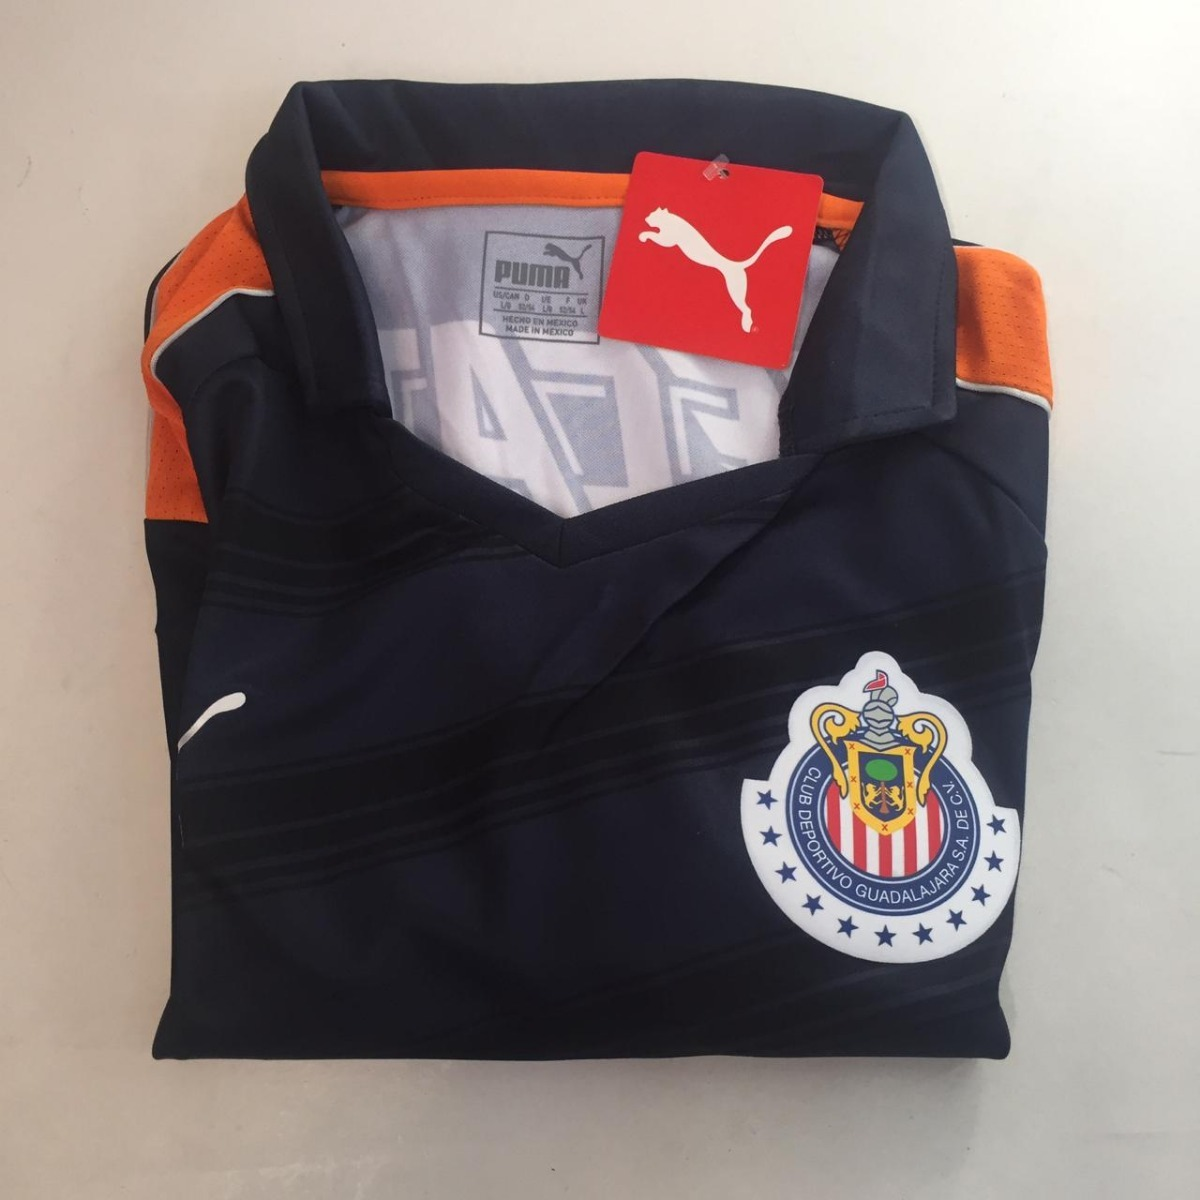 Jersey Chivas Camisa Original Puma Guadalajara Caballero -   549.00 ... 56ea507dcfc63